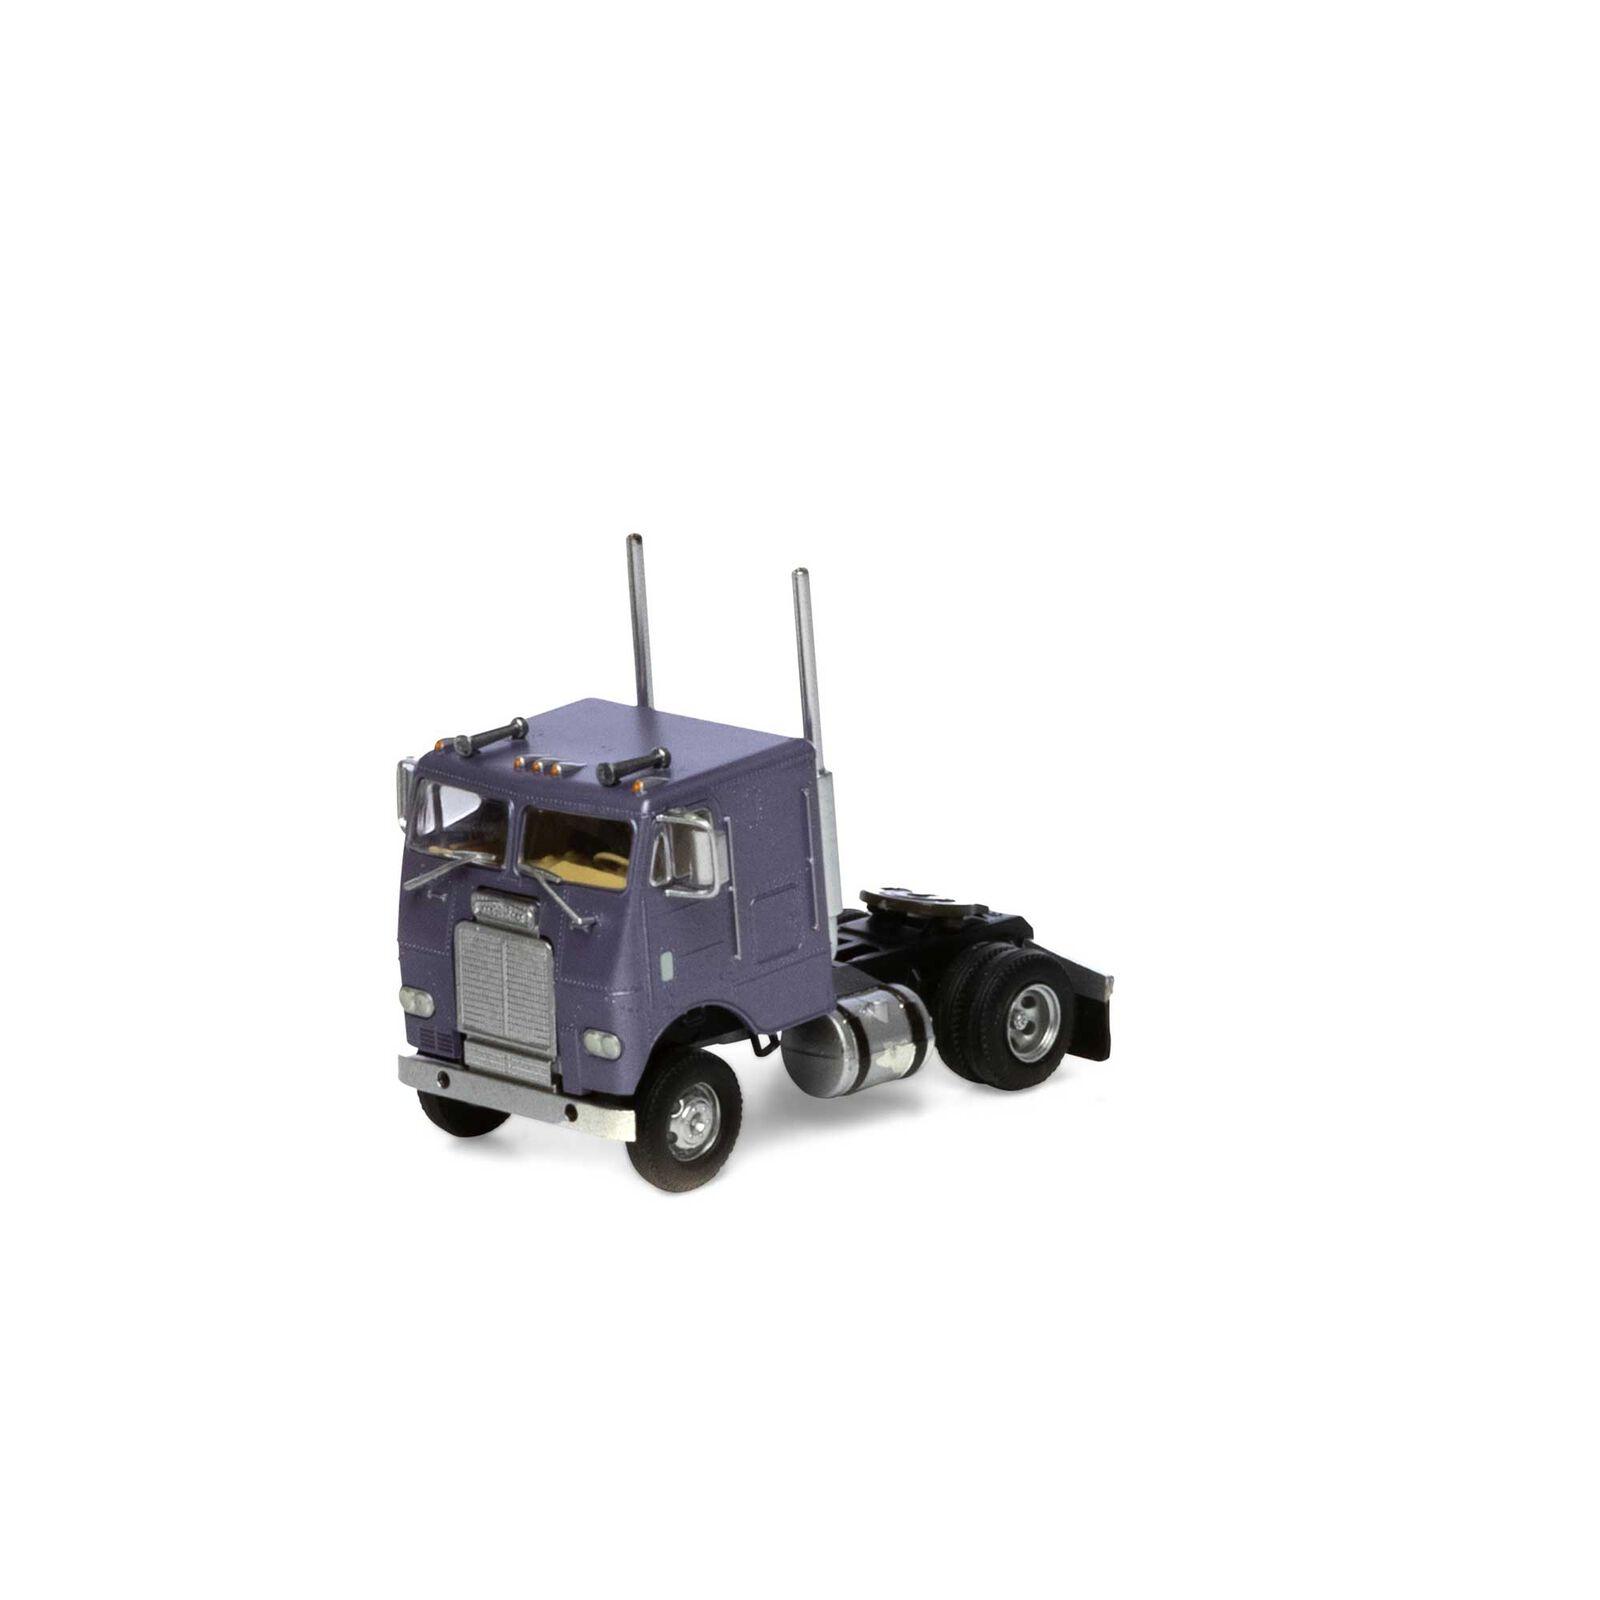 HO RTR FL with 3 Axle Metallic Purple